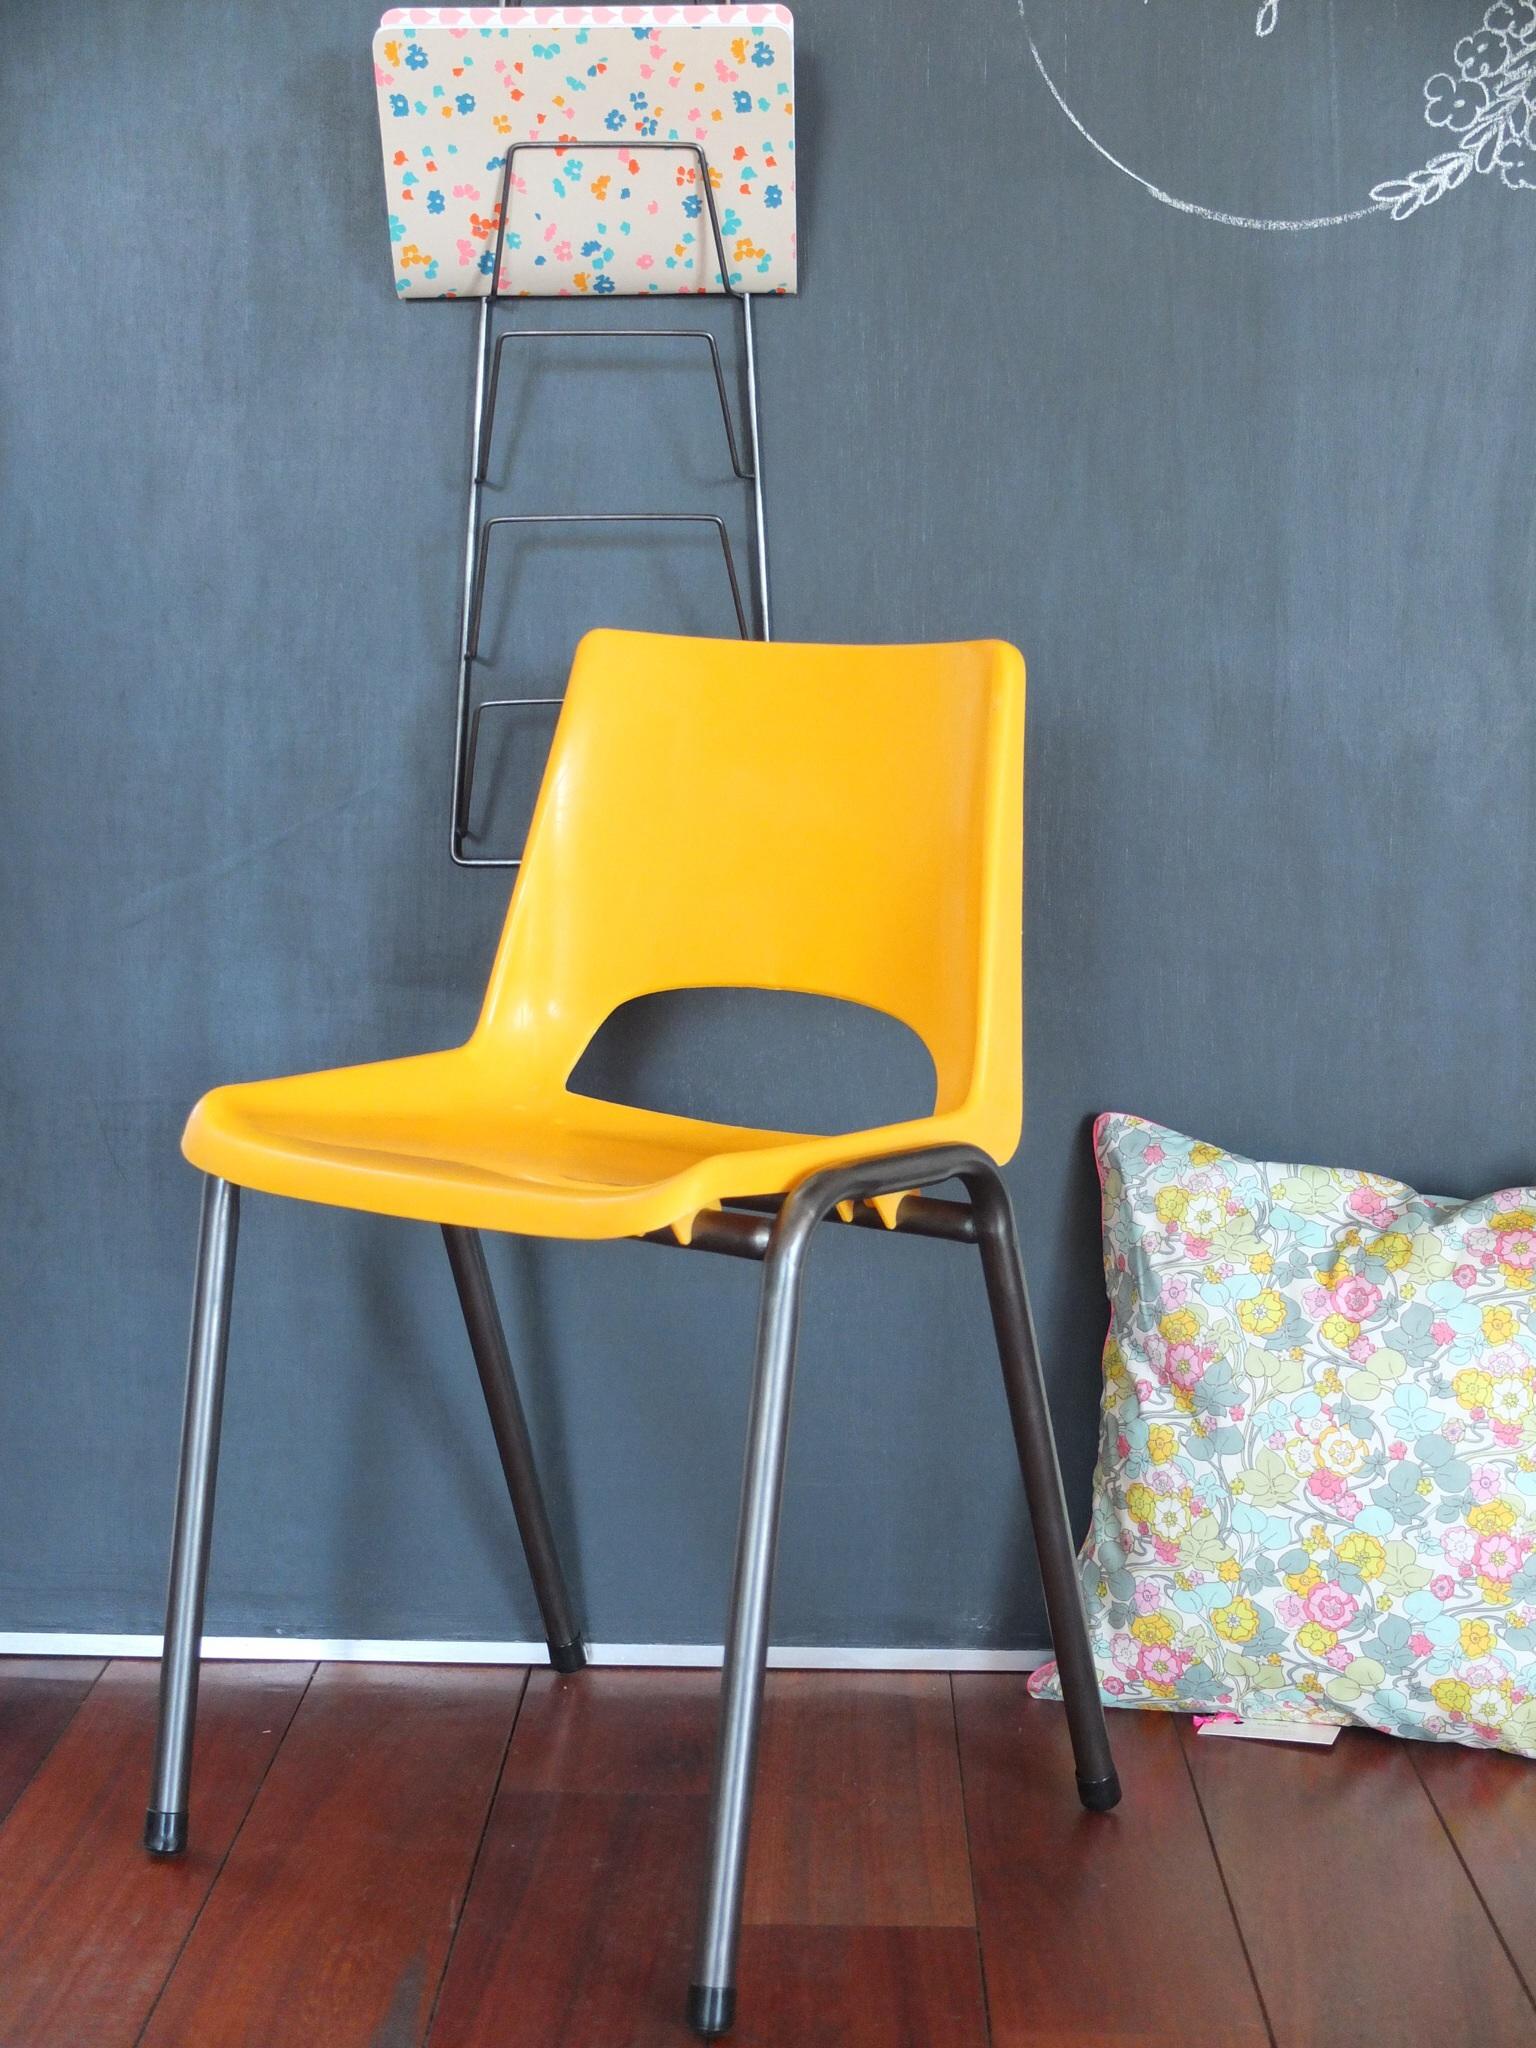 chaise enfant maternelle ann es 60 70. Black Bedroom Furniture Sets. Home Design Ideas